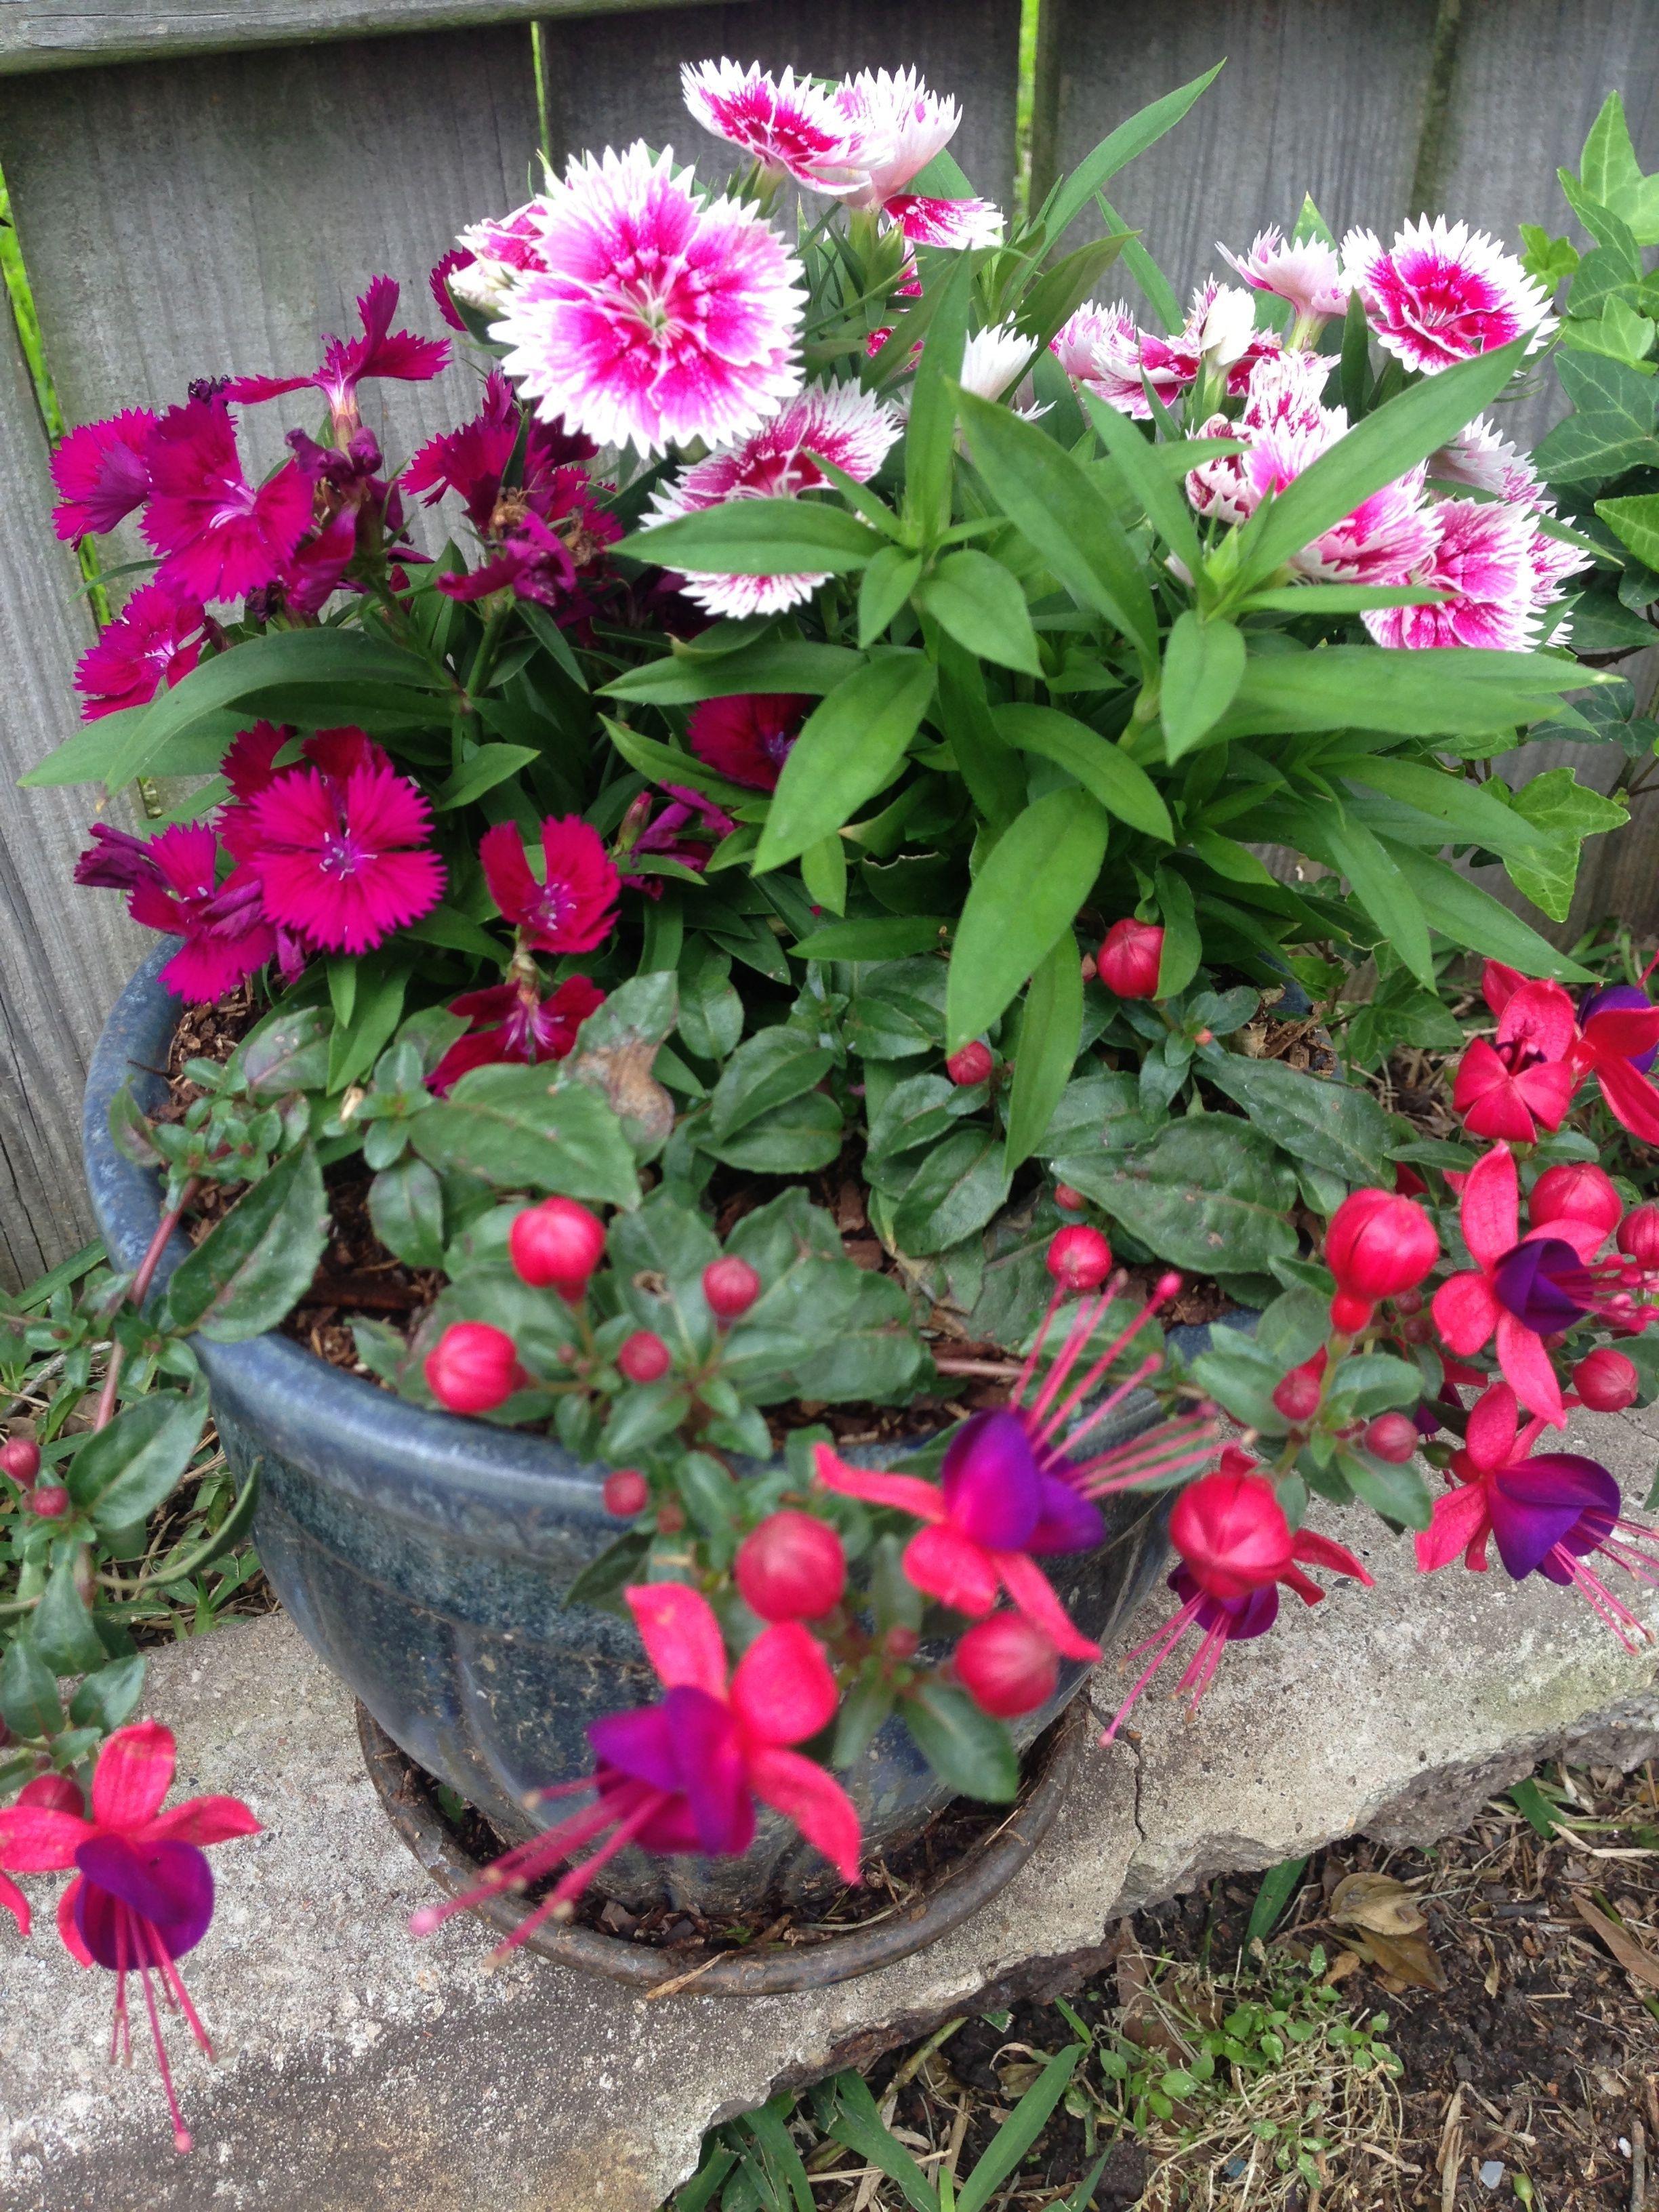 Pin By Kari Ruden On It S Not That Easy Being Green Container Flowers Backyard Garden Garden